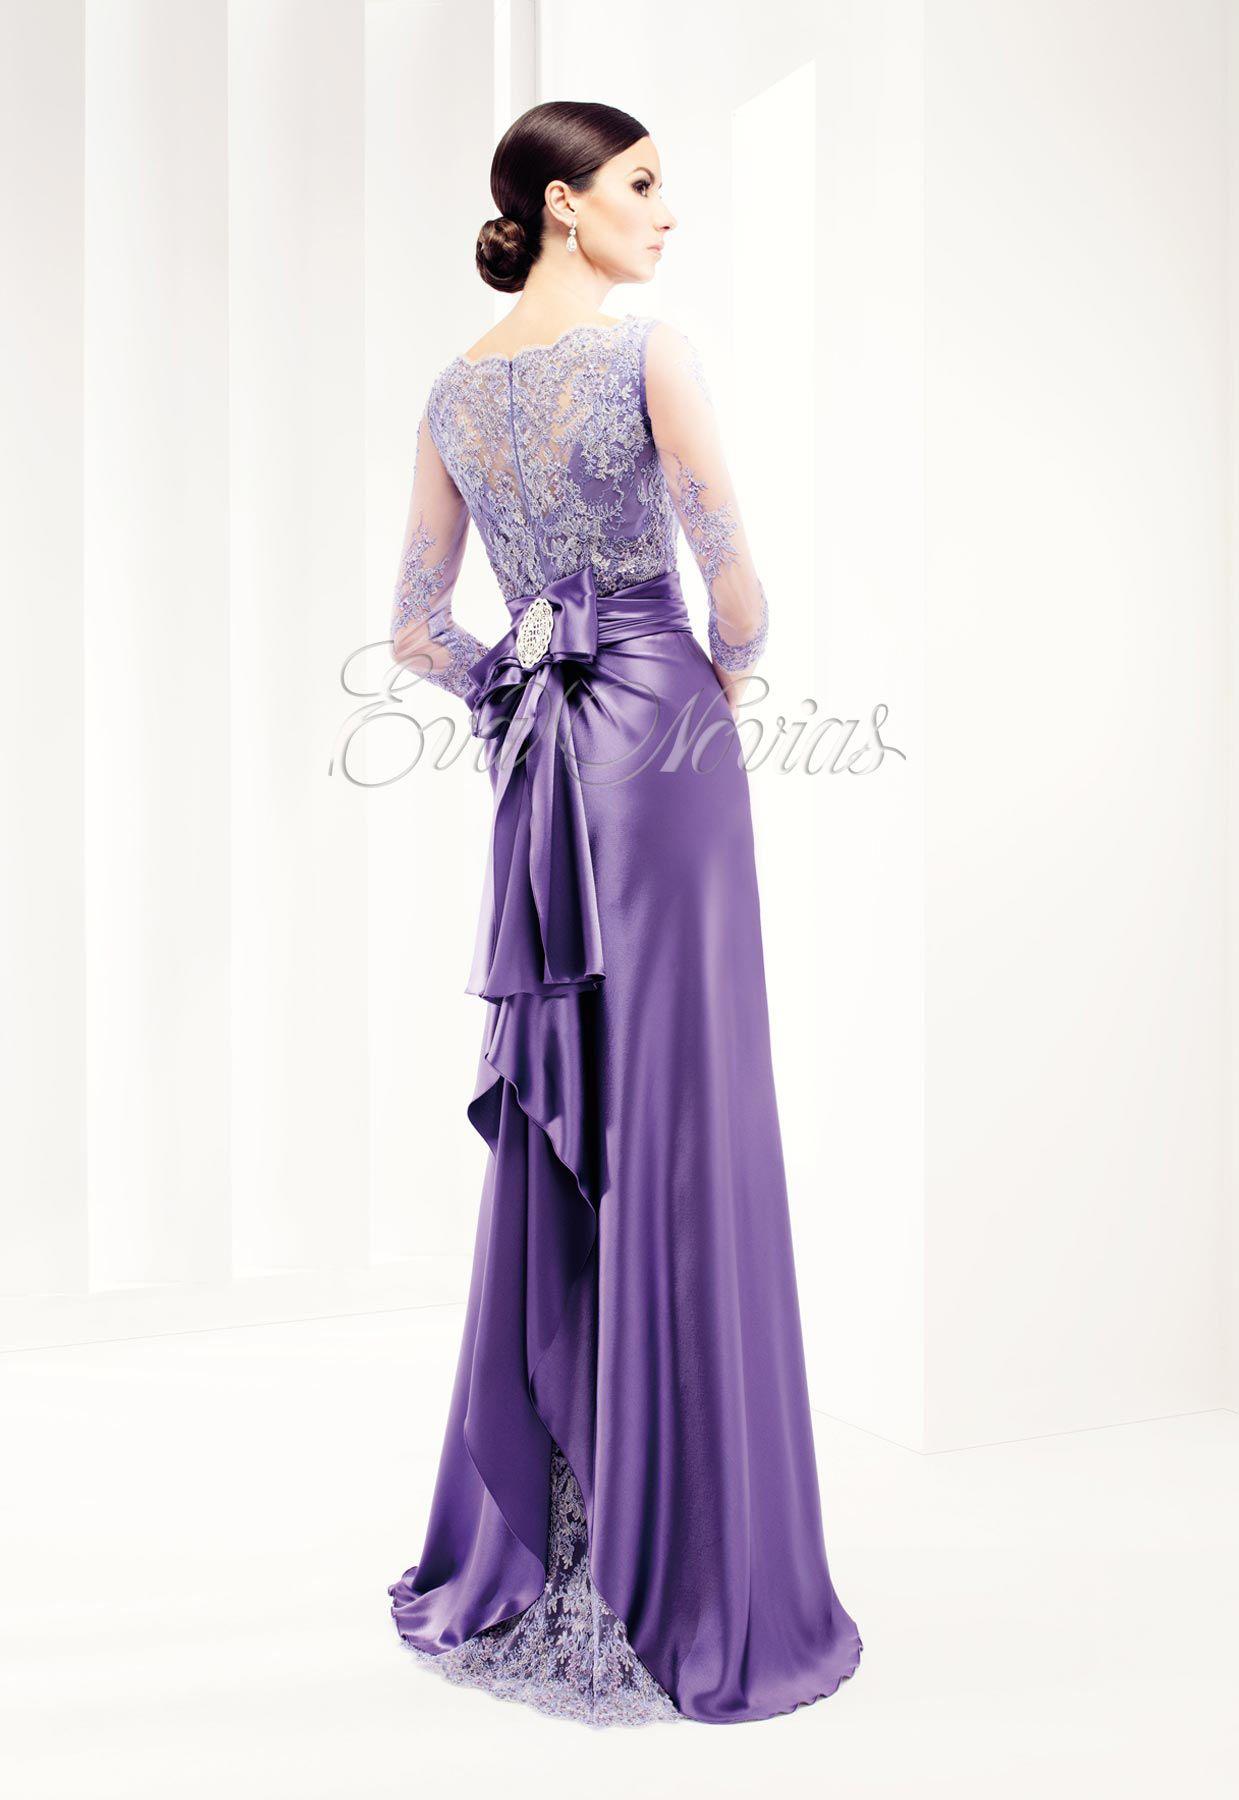 Lujoso Vestidos De Novia Para Señoras Maduras Motivo - Vestido de ...